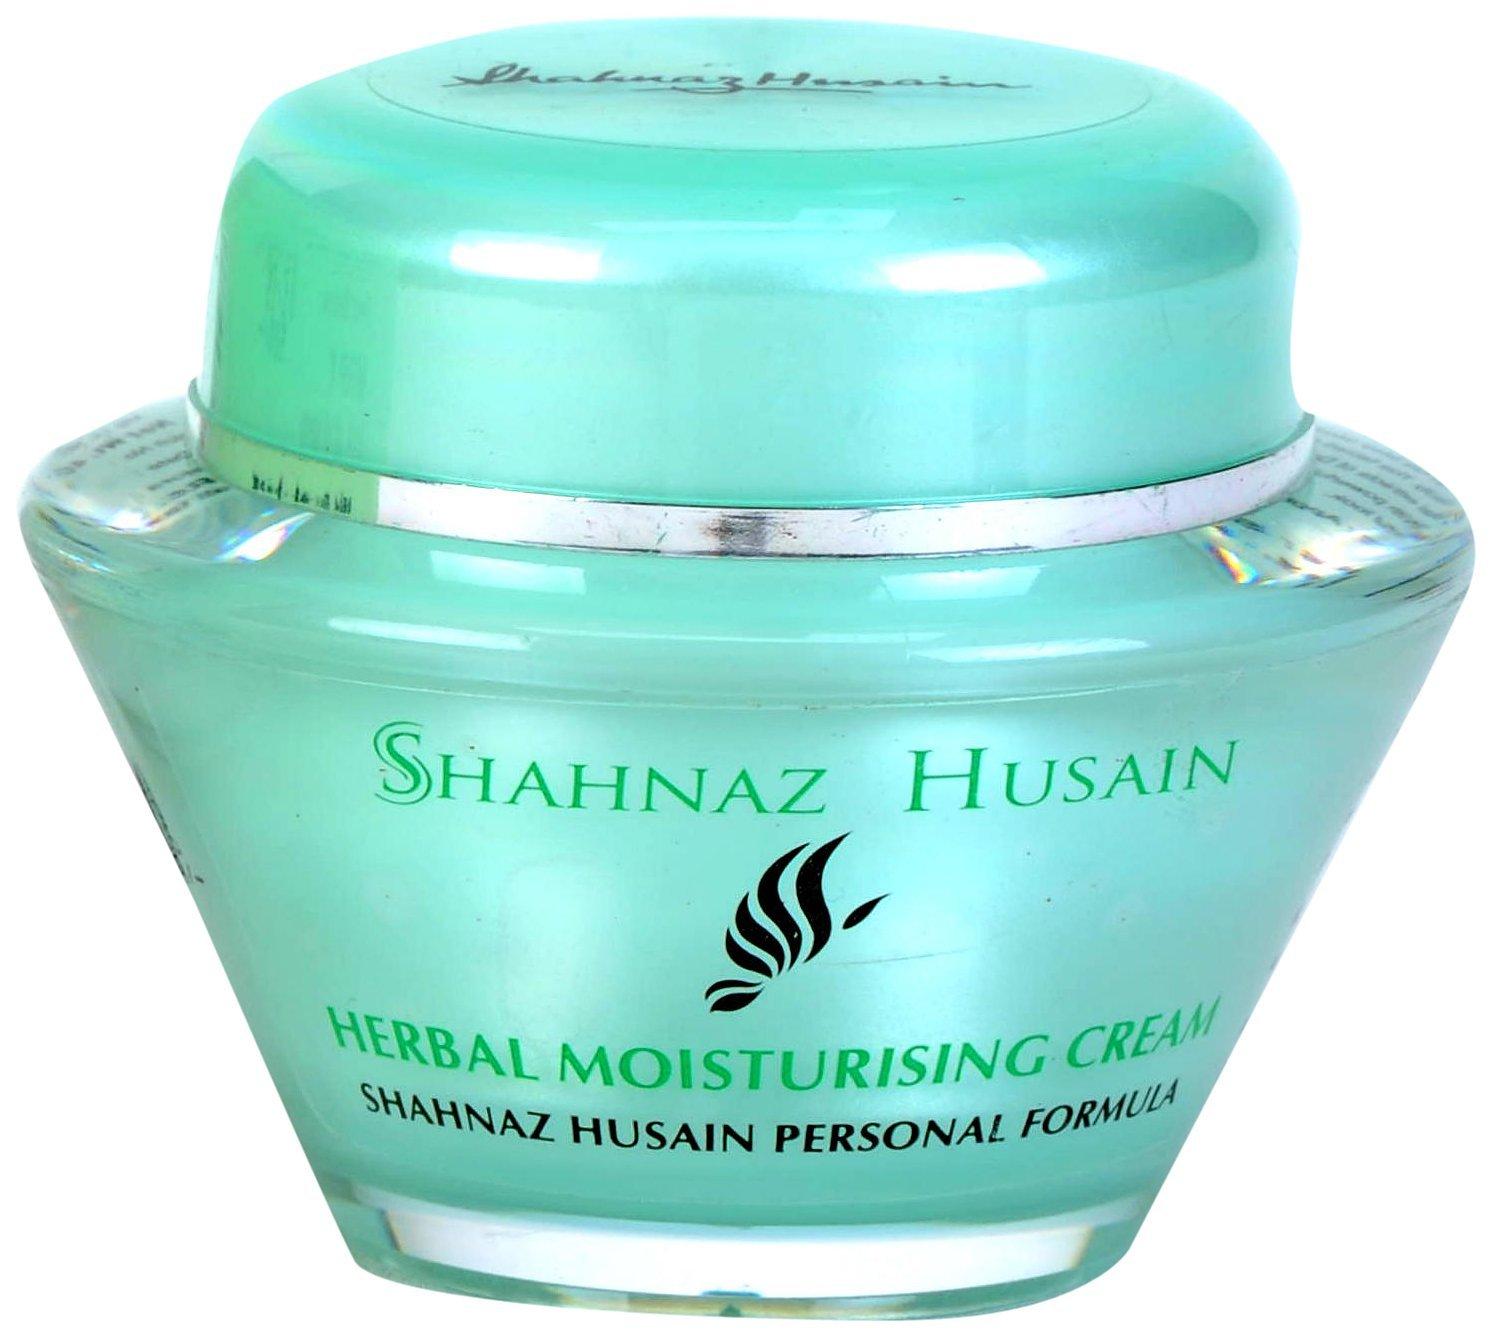 Buy Shahnaz Husain Personal Formula Herbal Moisturising Cream Online MY